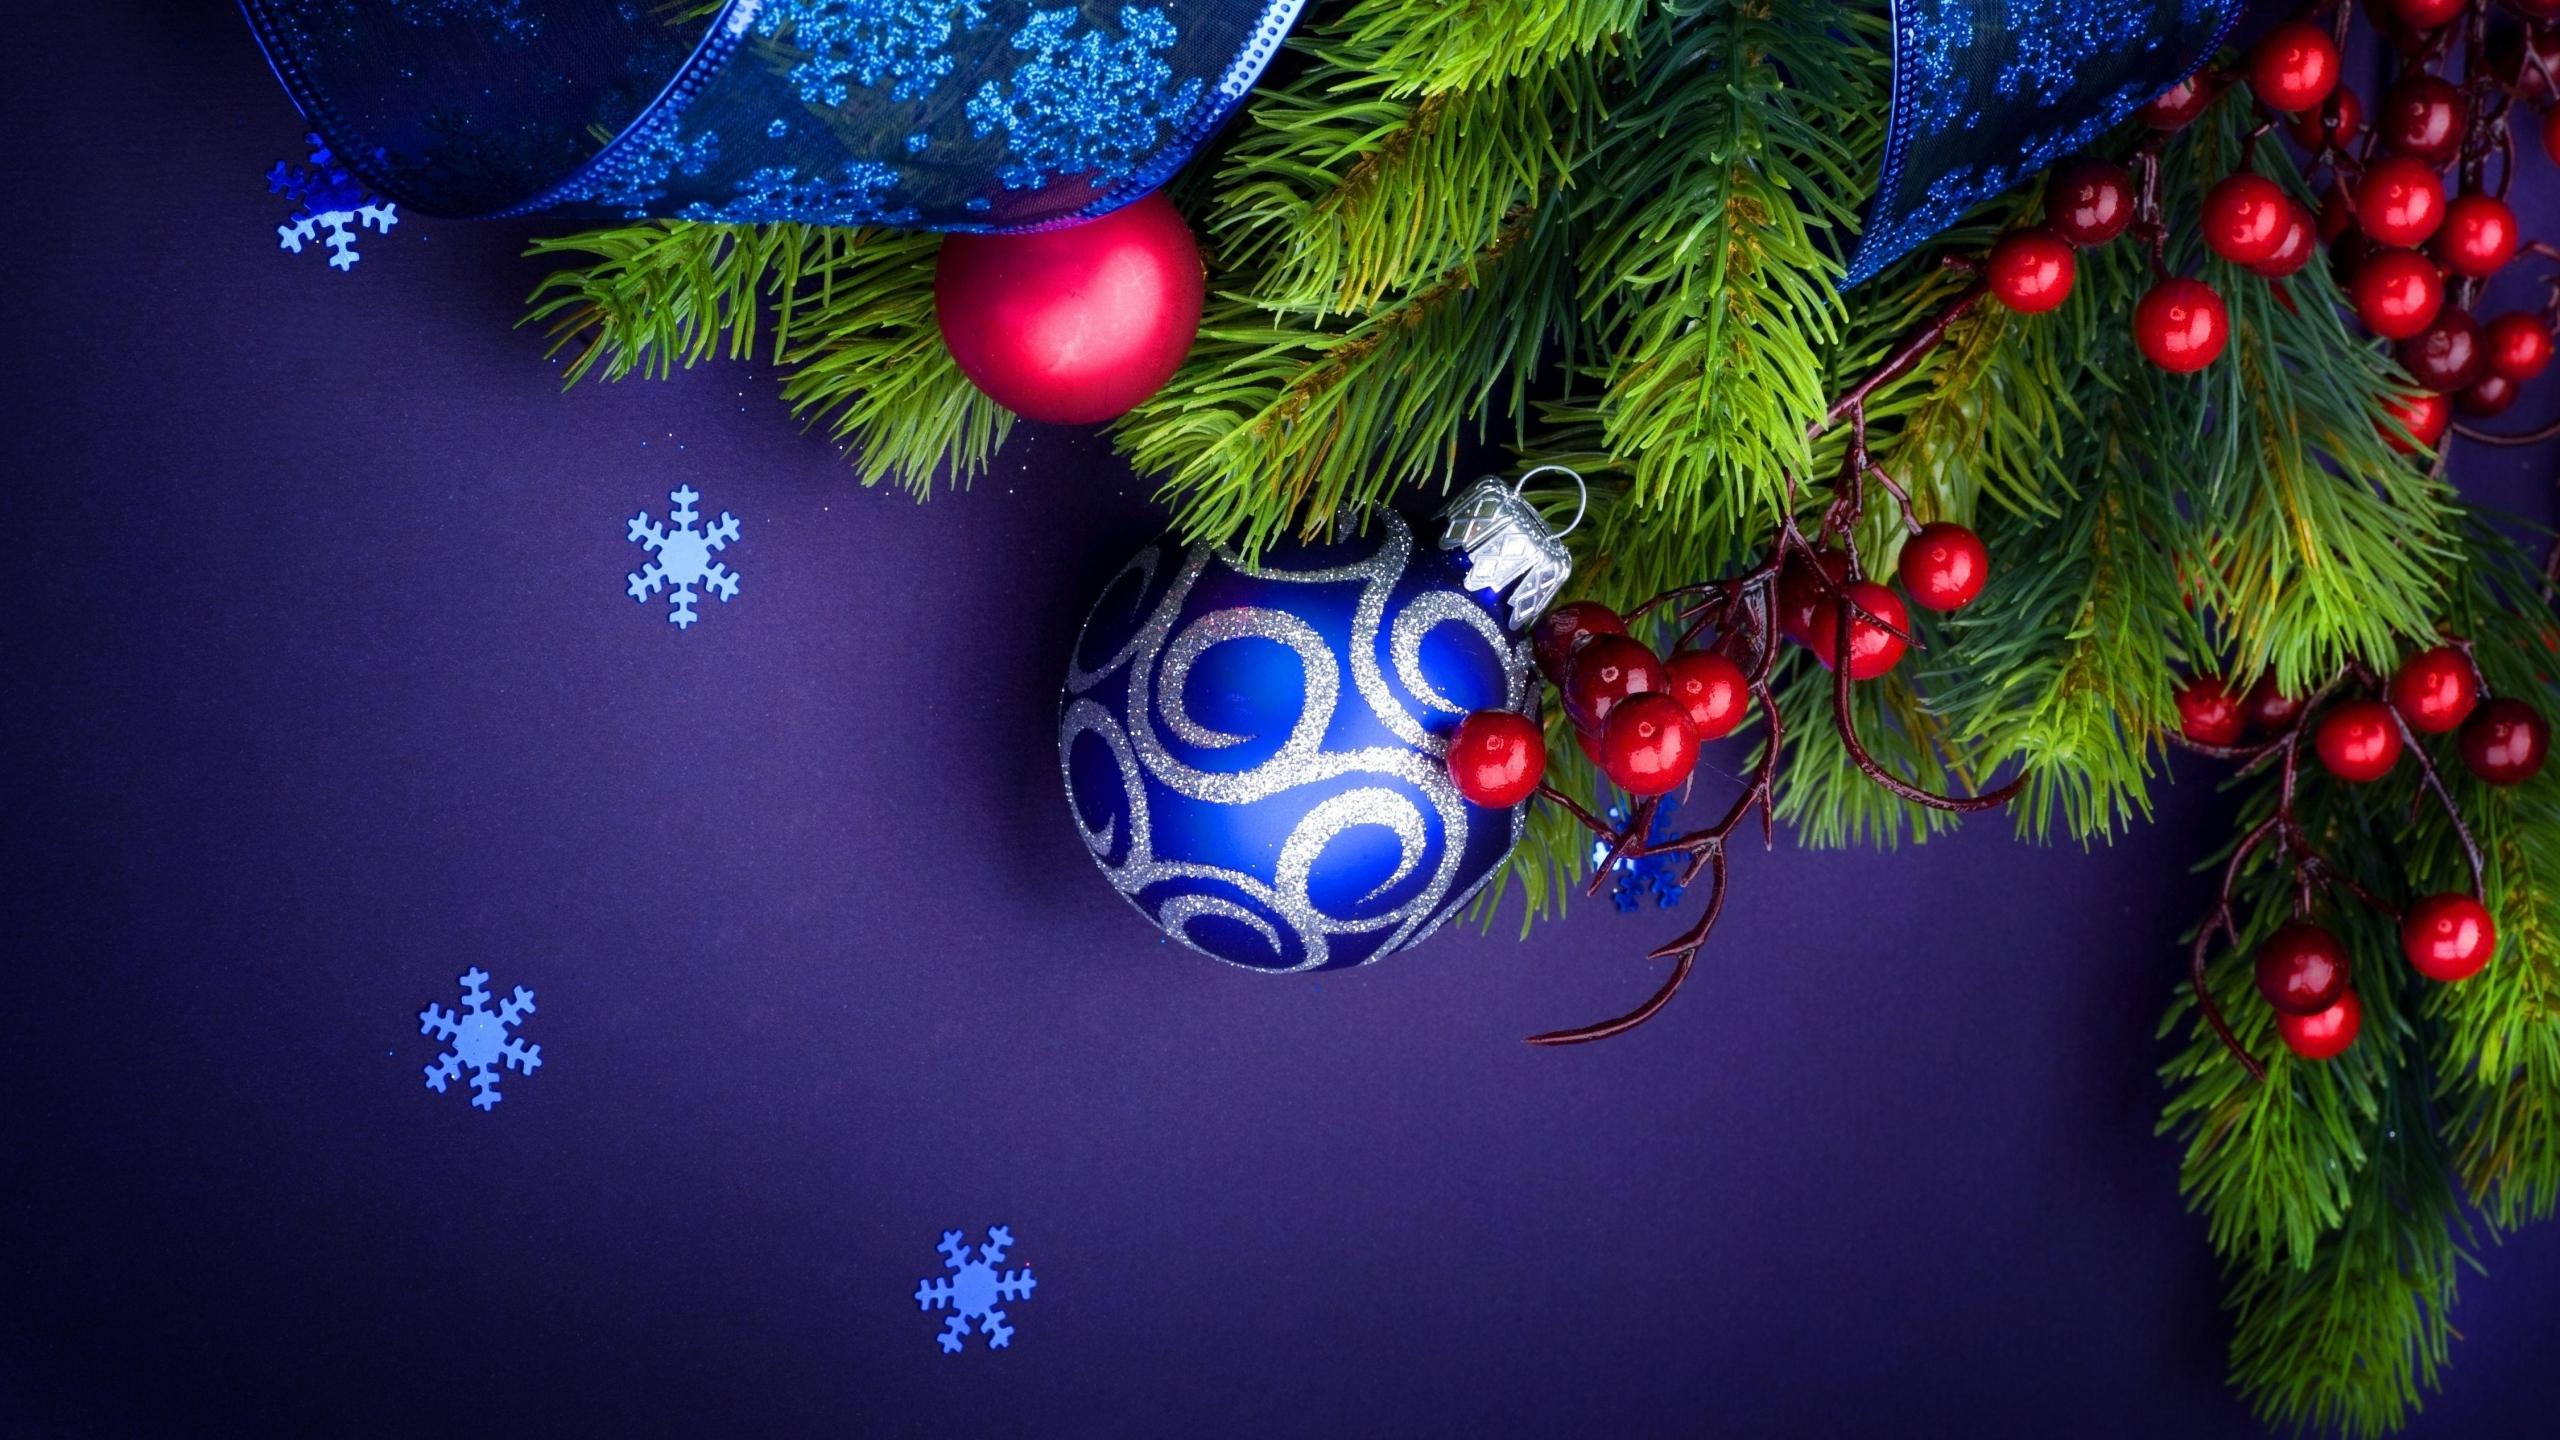 Free Holiday Wallpaper - Free Christmas Wallpaper 4k , HD Wallpaper & Backgrounds